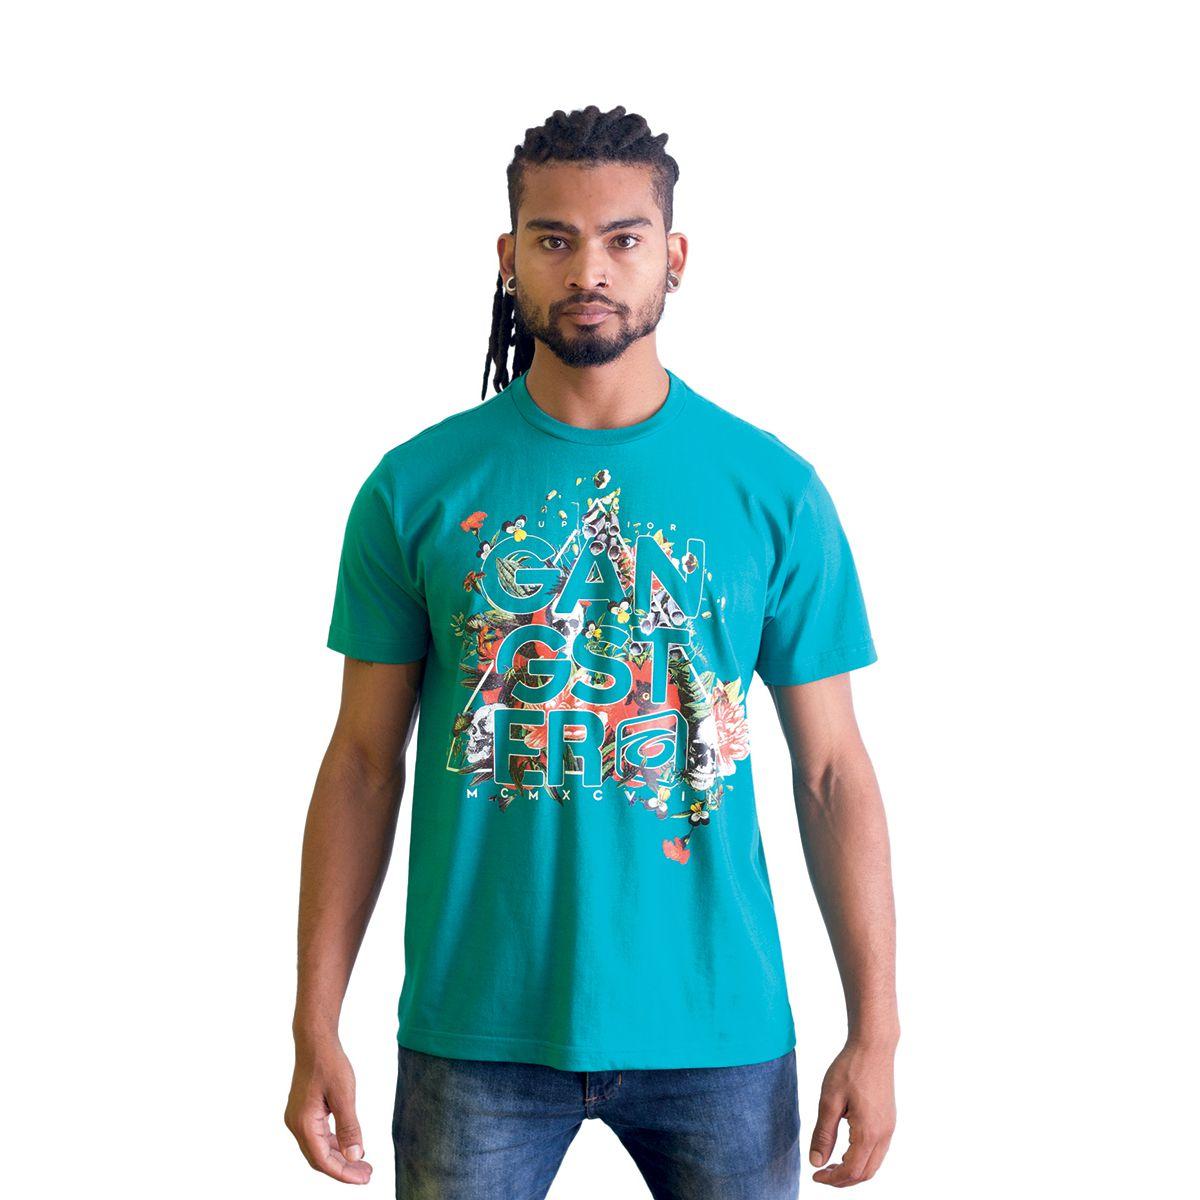 Camiseta Masculina Básica Estampada Gangster 10.01.8514